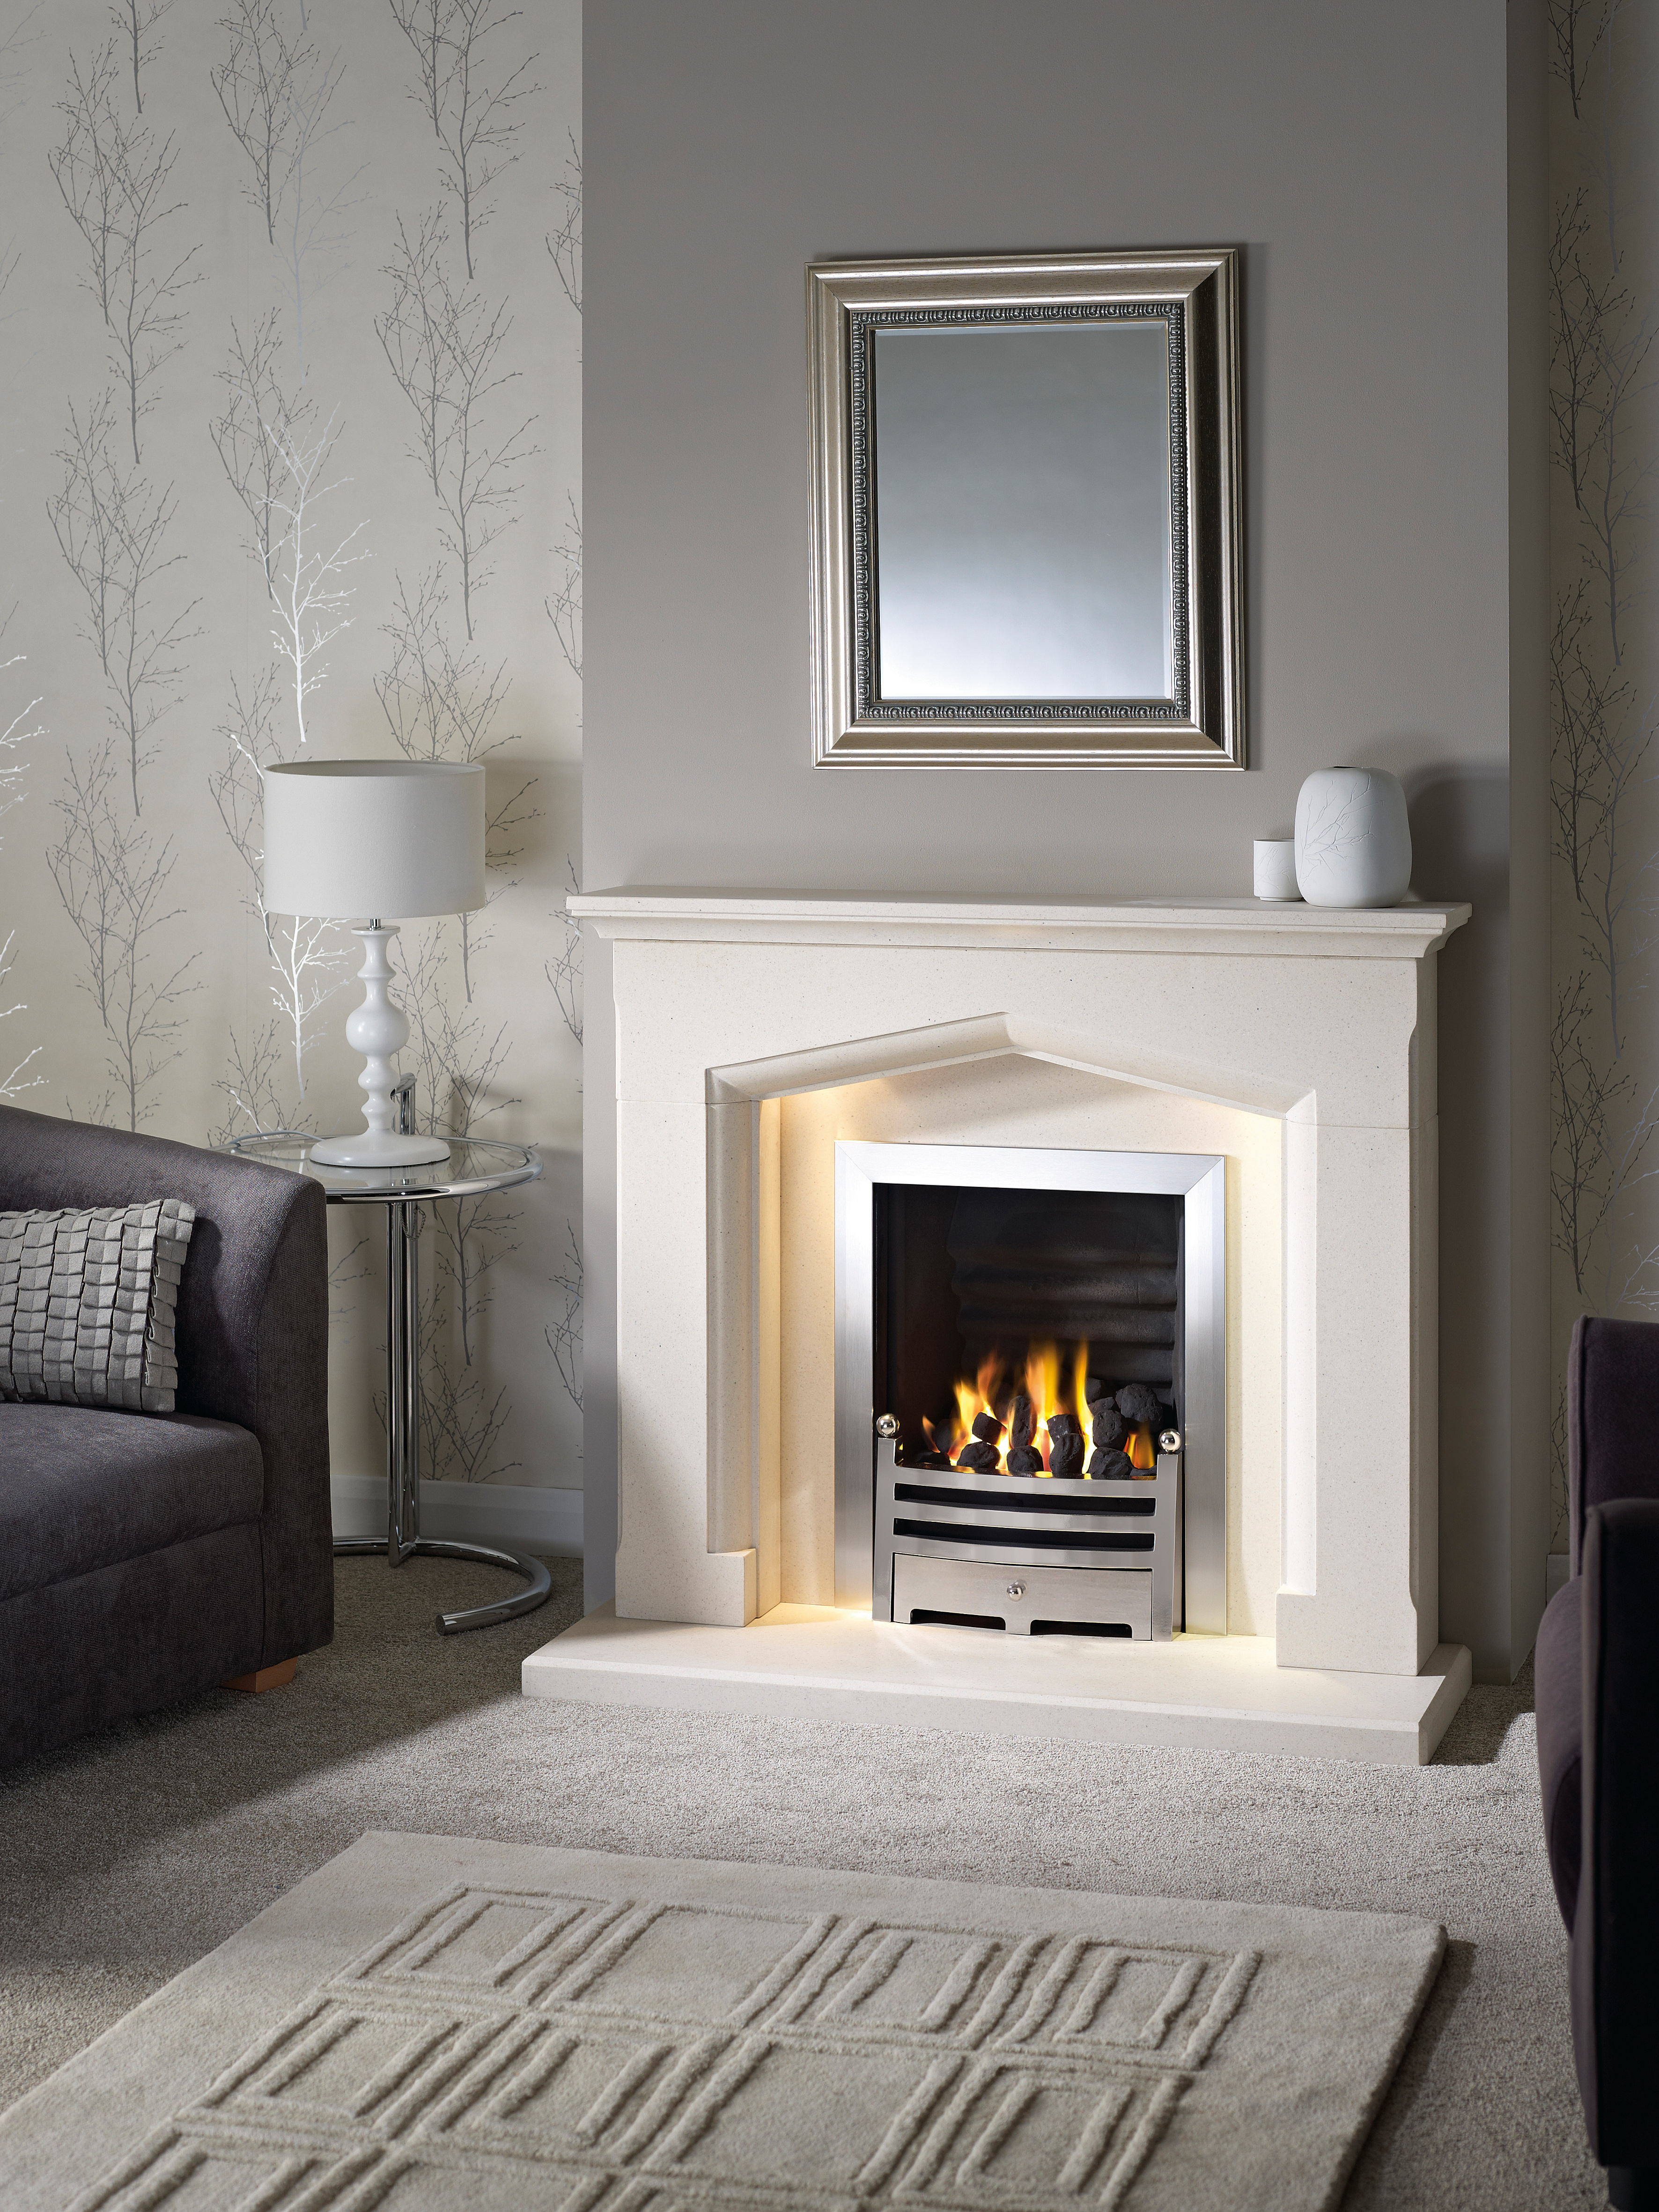 Swinford Agean Limestone With Gas Fire Fireplaces